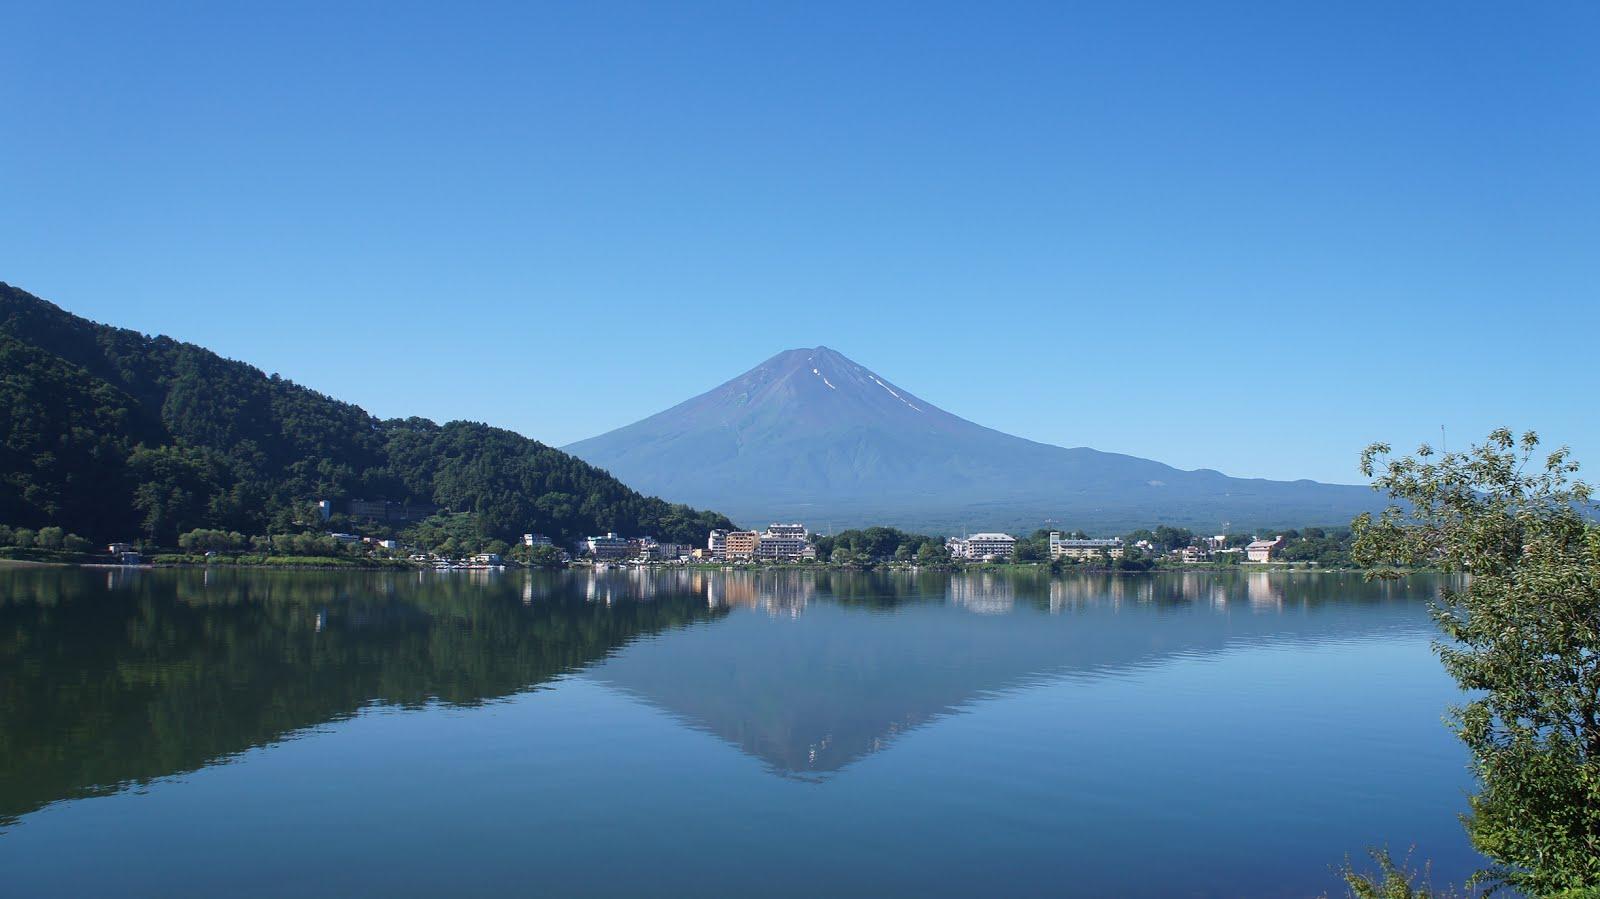 Mount Fuji, Japan, 2015